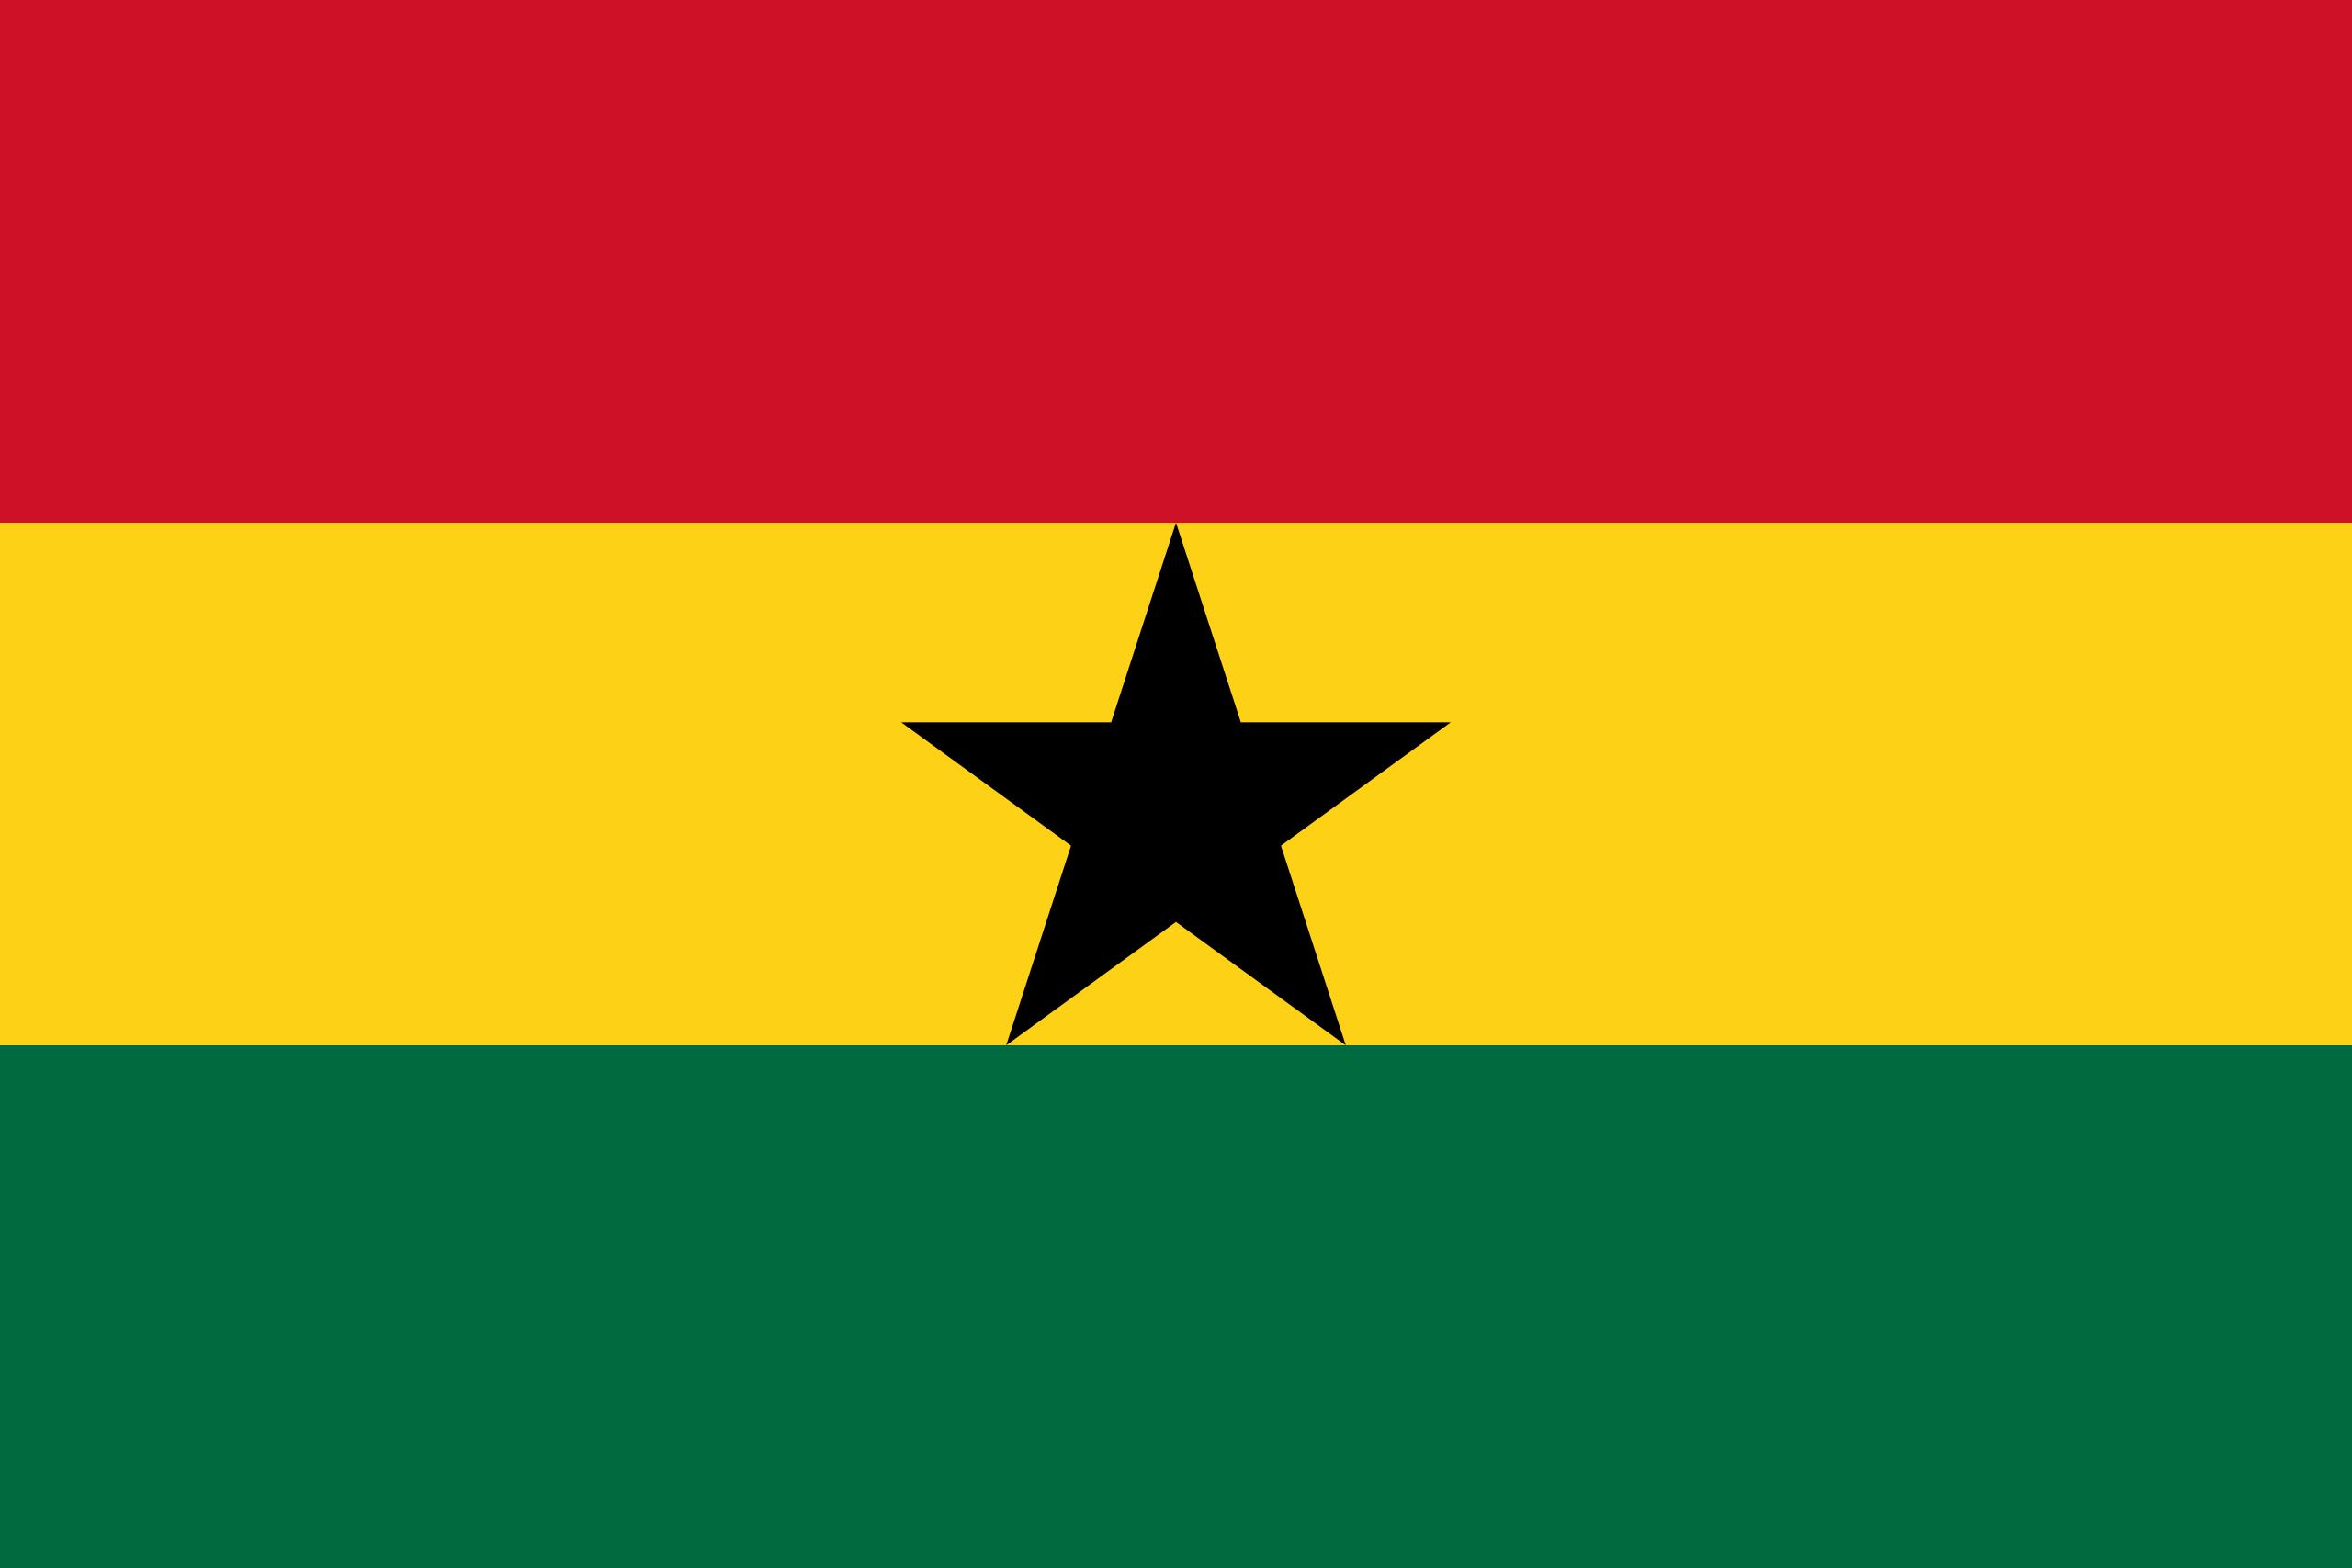 ghana, país, emblema, insignia, símbolo - Fondos de Pantalla HD - professor-falken.com